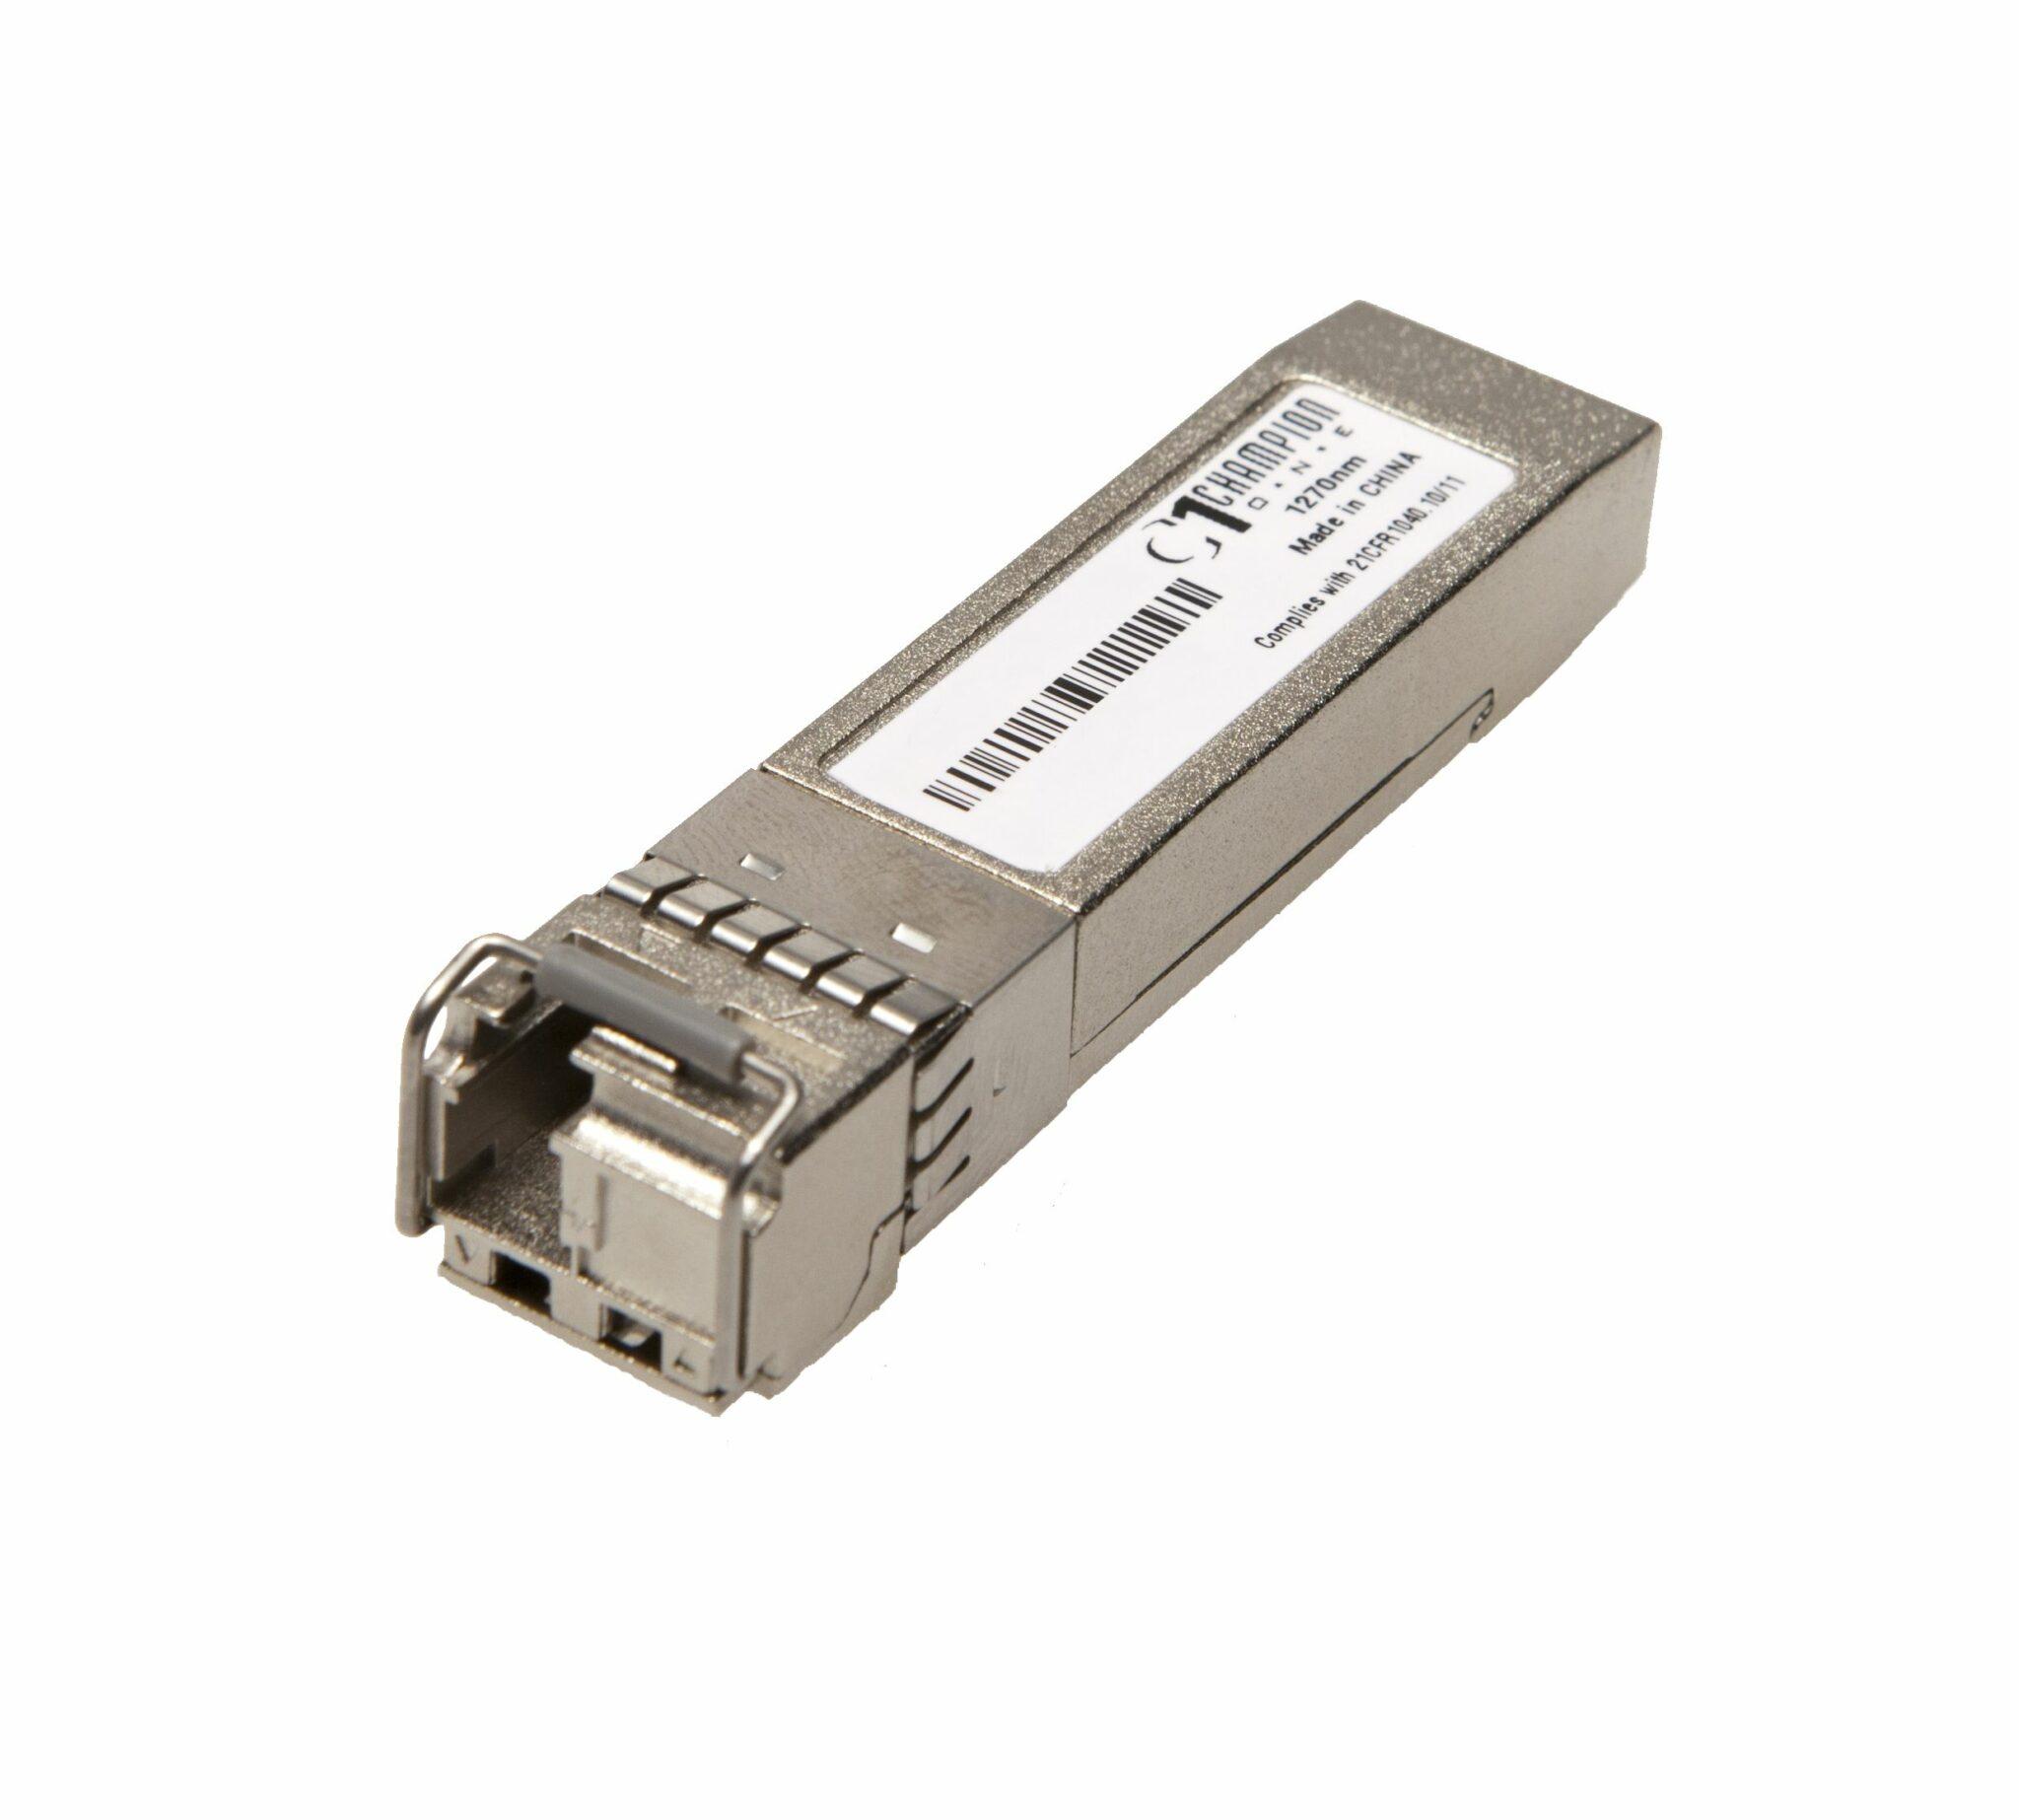 Single Fiber 10GE LAN and WAN, 80km, 10GSFP+E55B80L